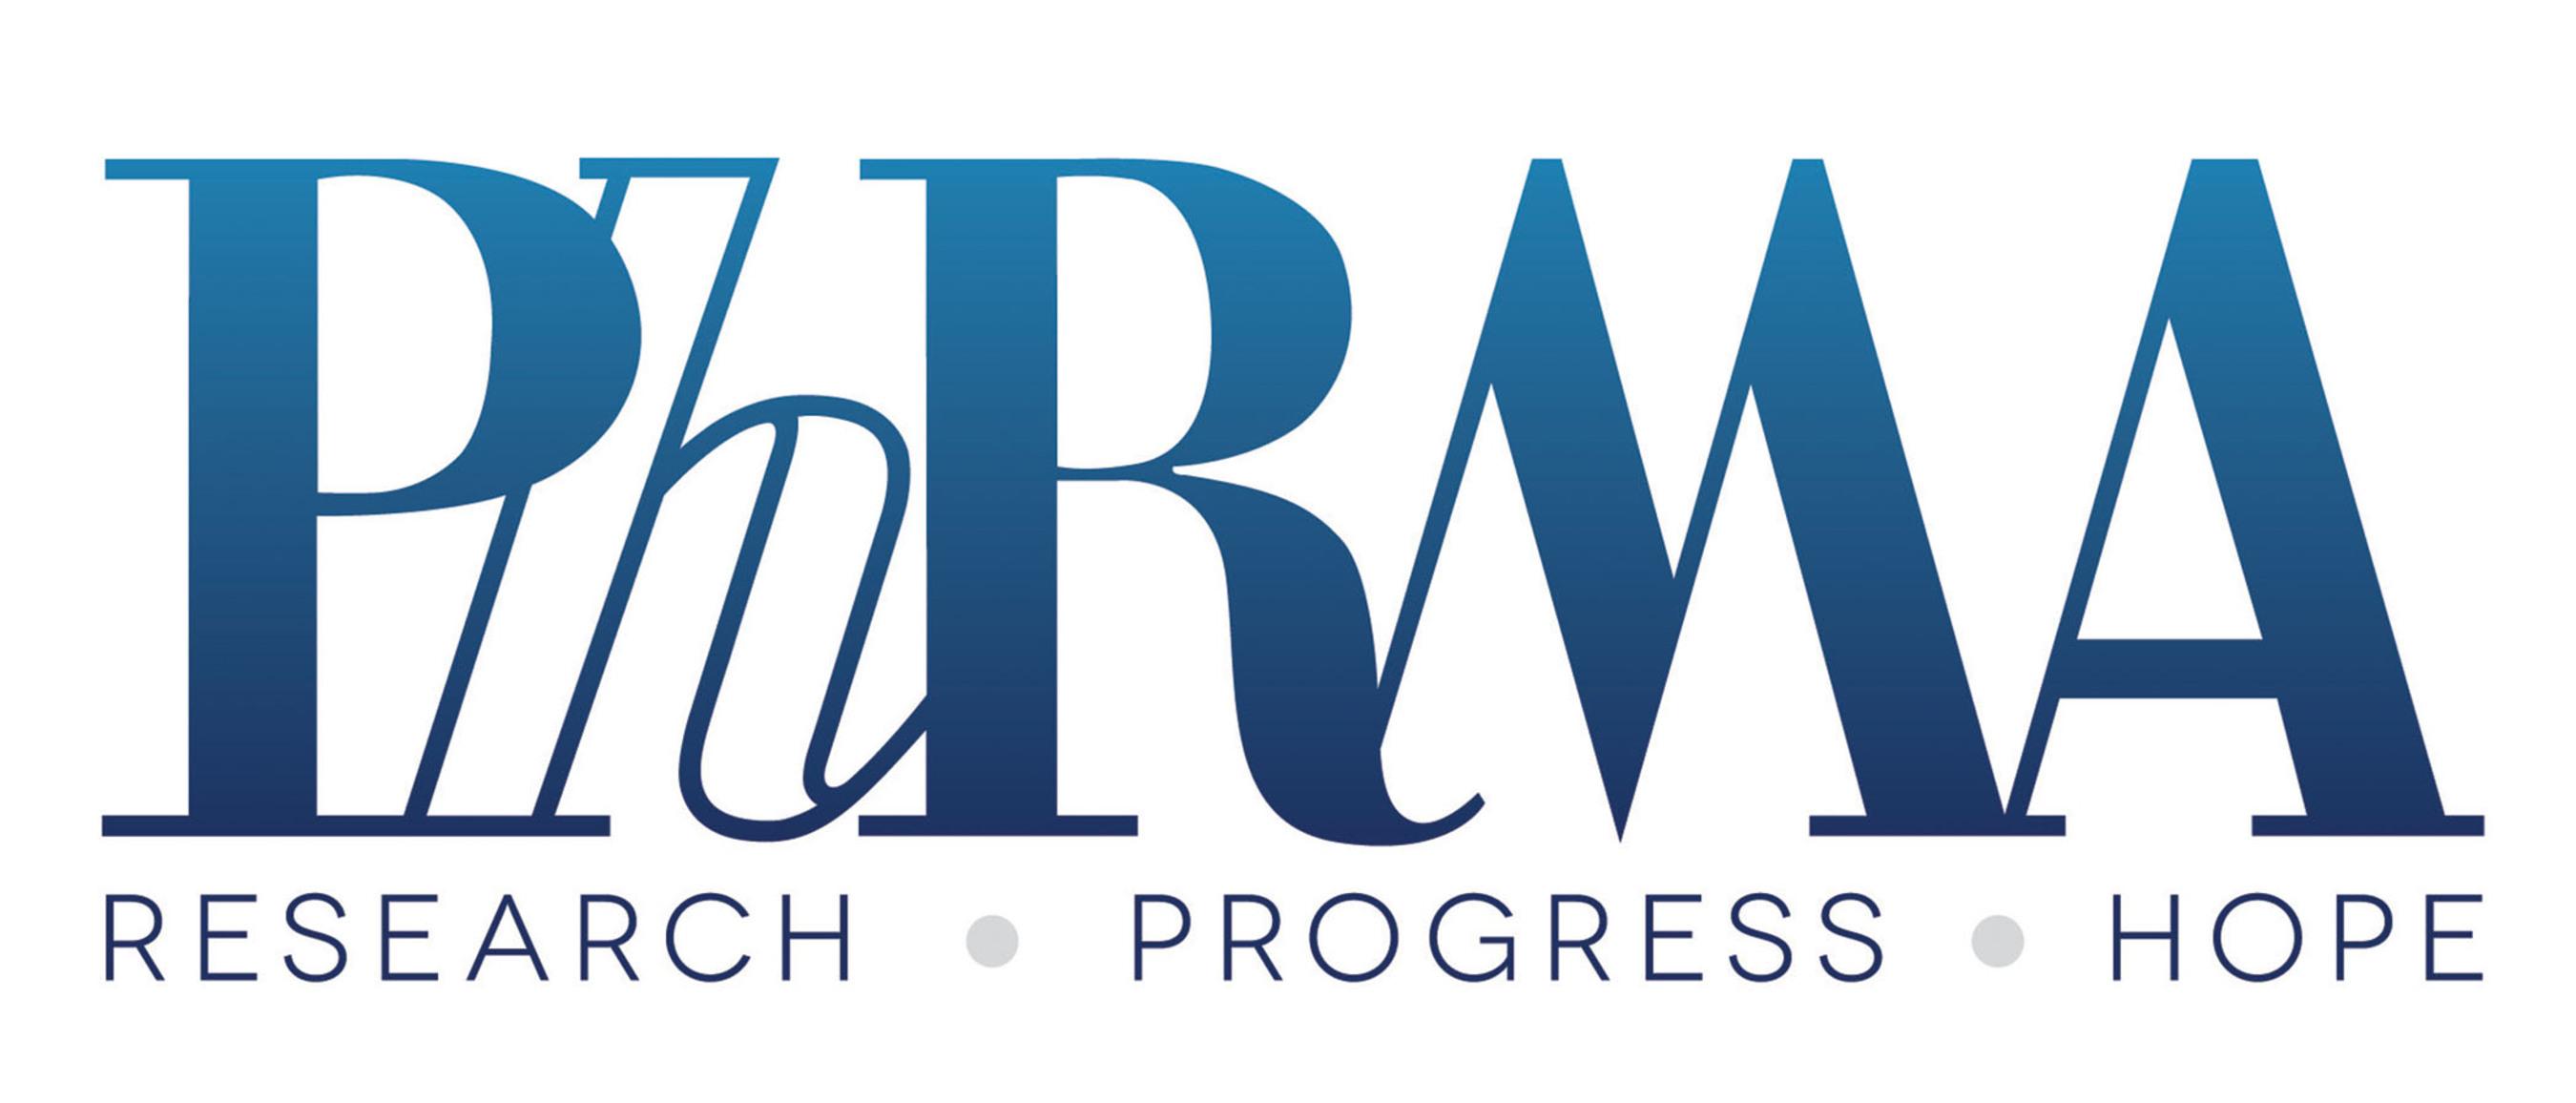 PhRMA Research Progress Hope